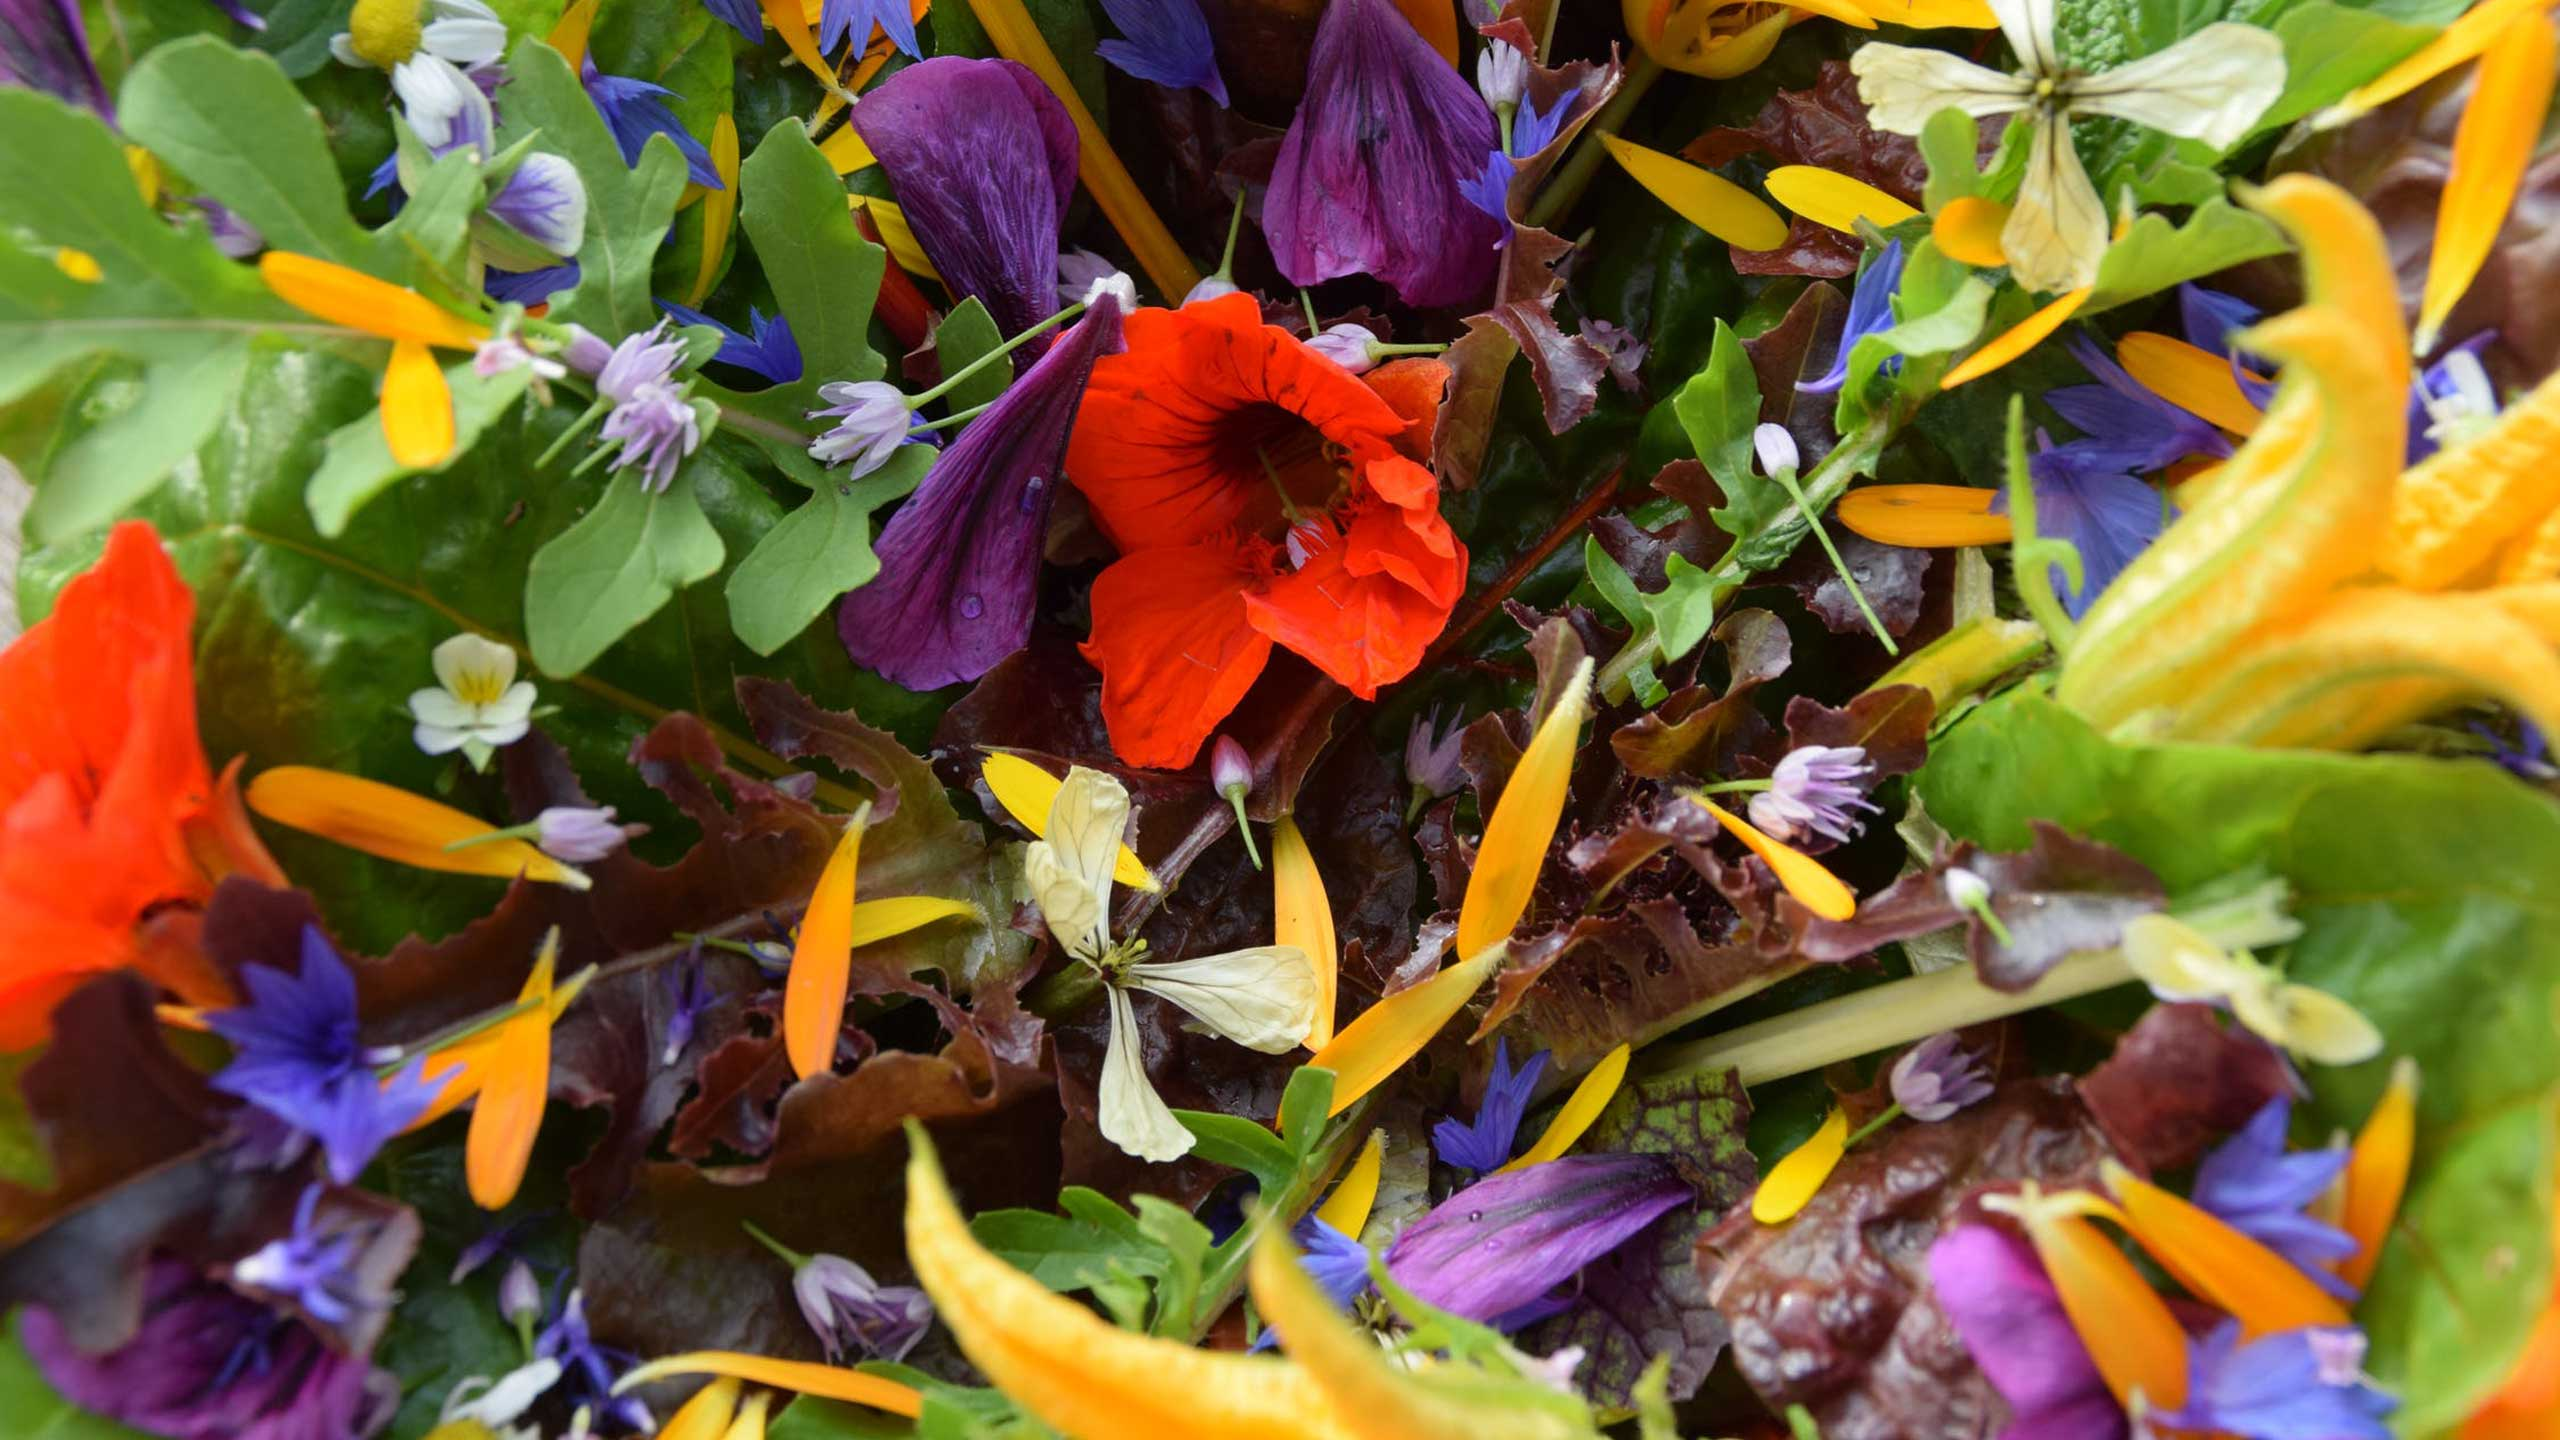 flores comestibles, usos, colores, sabores, aromas, sabor